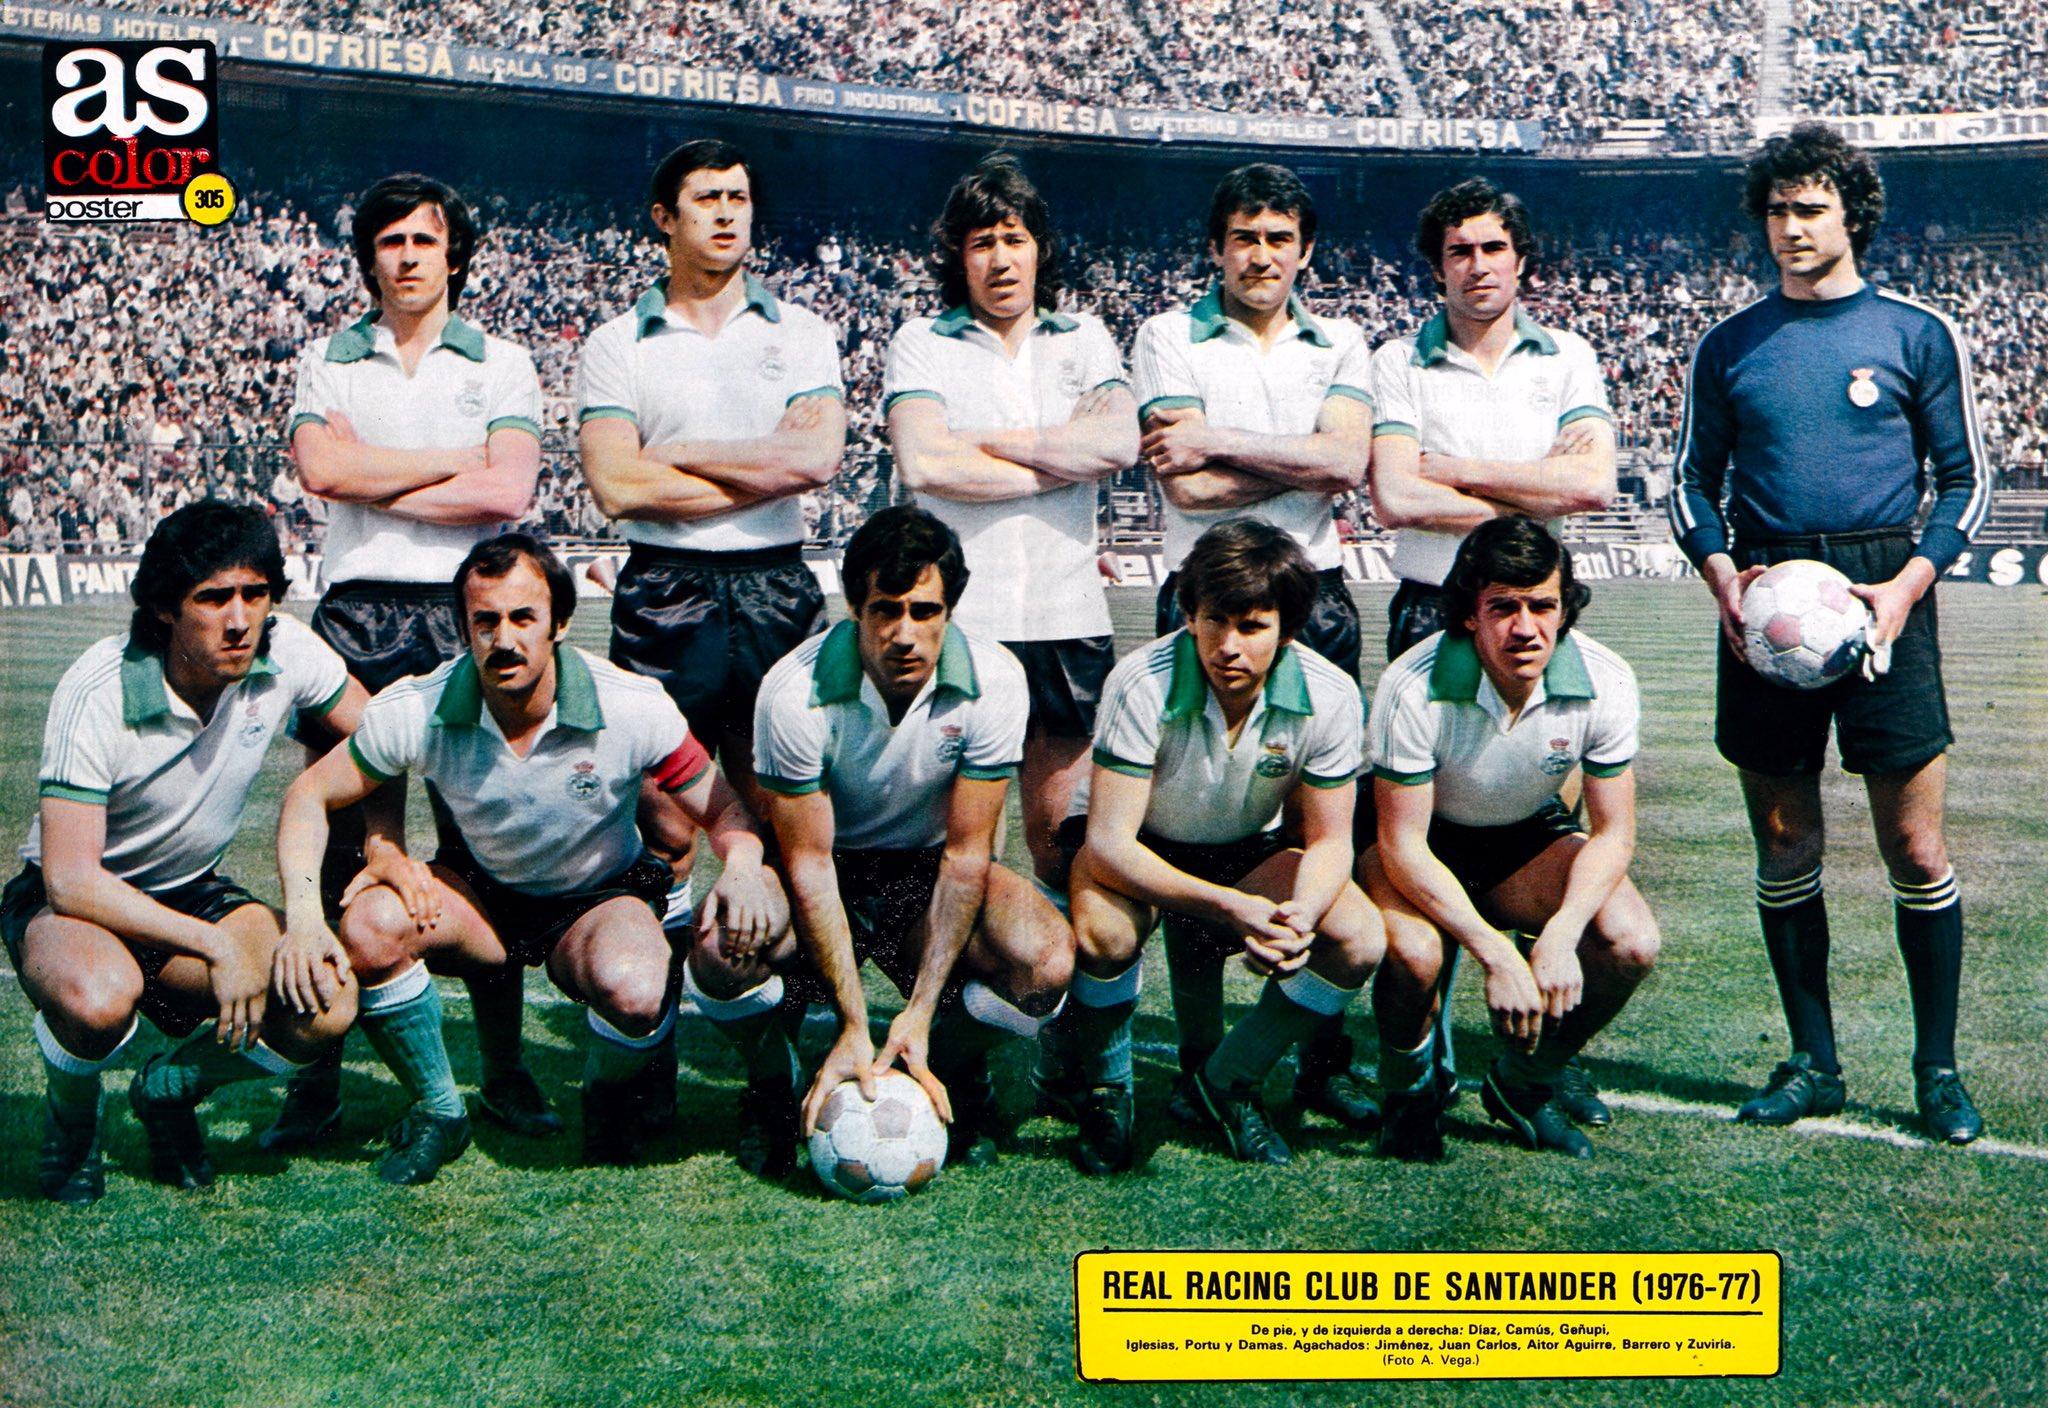 FOTOS HISTORICAS O CHULAS  DE FUTBOL - Página 5 Dw-yQ3cW0AAON38